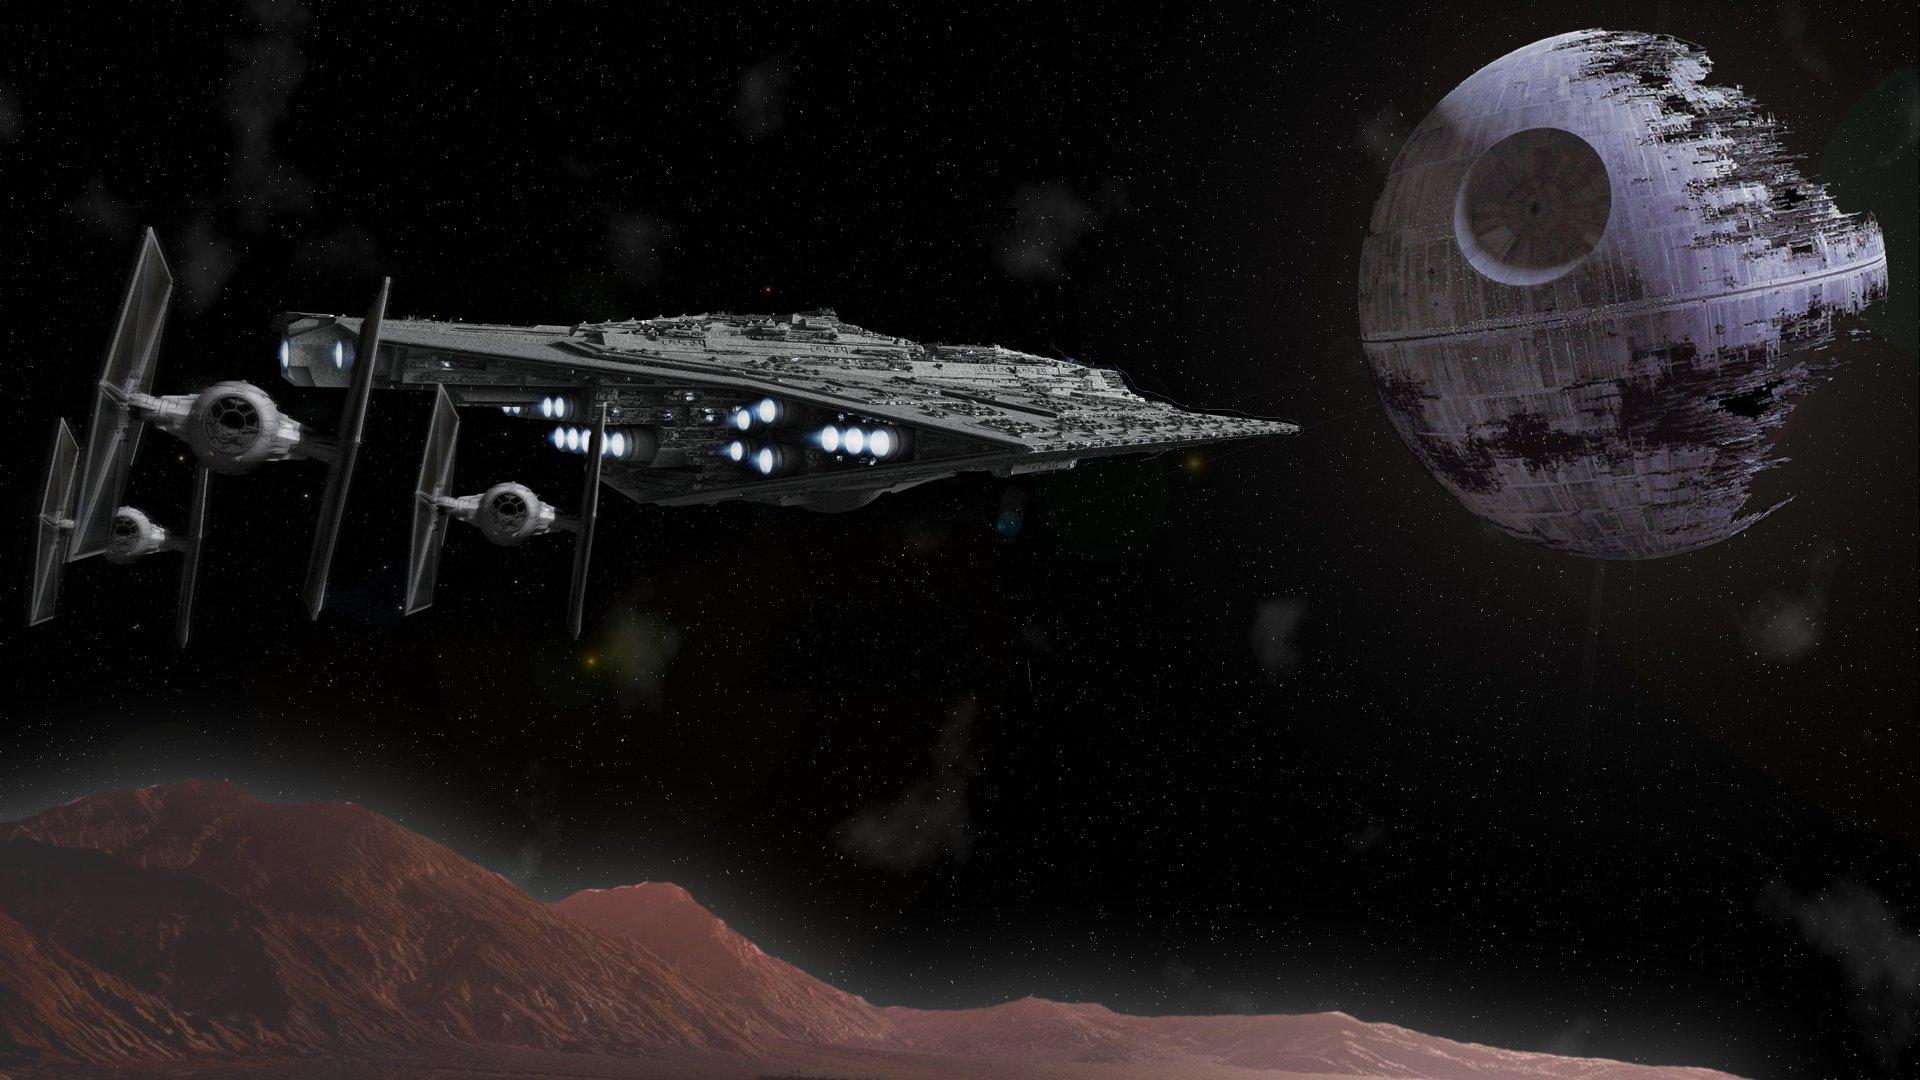 Wallpaper 1920x1080 Px Death Star Executor Class Star Destroyer Spaceship Star Wars Tie Fighter 1920x1080 Wallhaven 1314701 Hd Wallpapers Wallhere